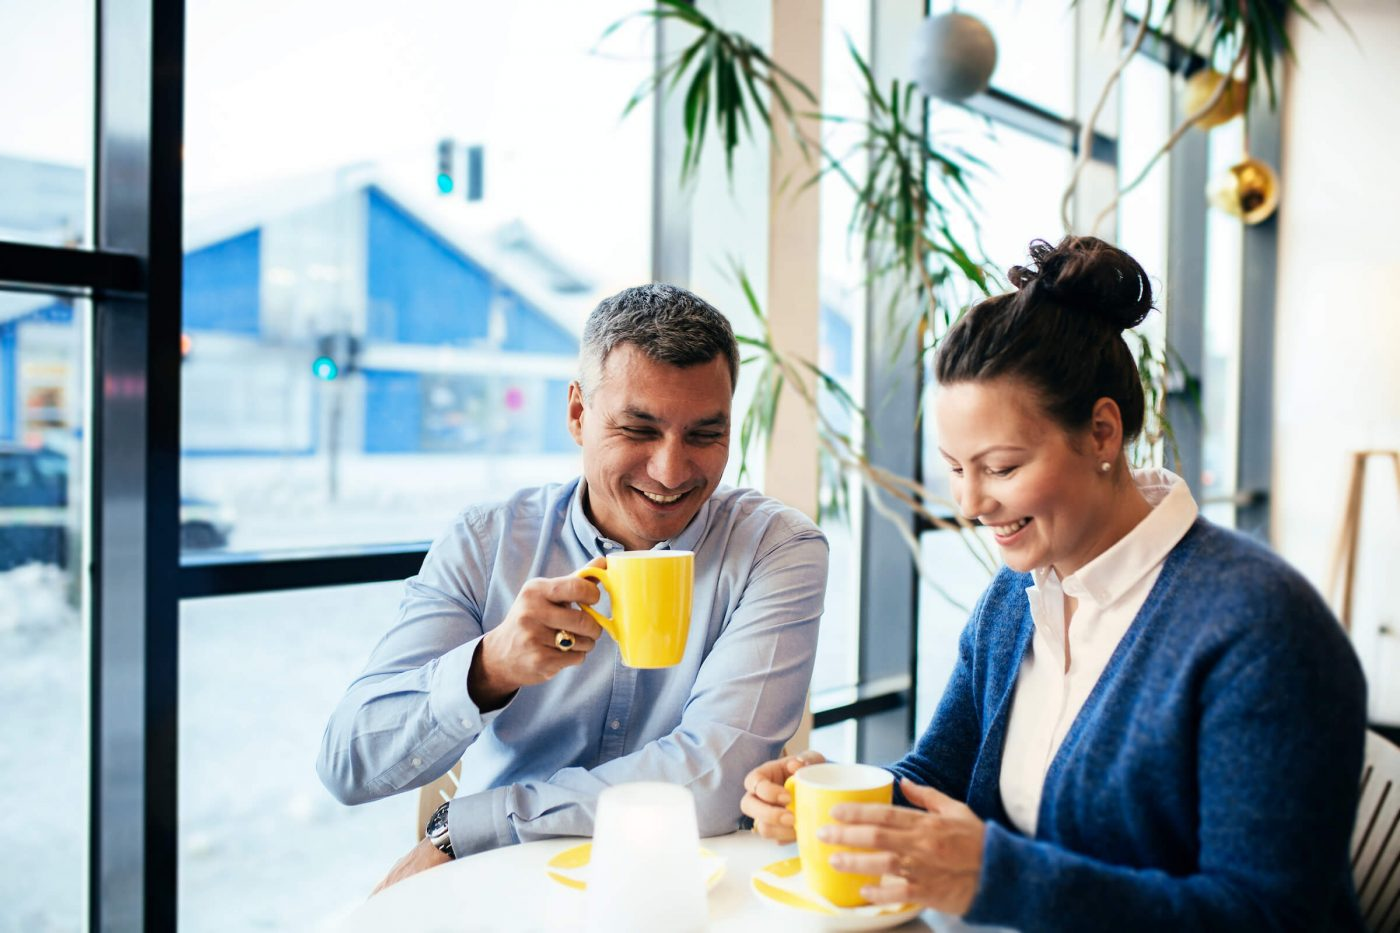 Couple enjoying coffee in Hotel Hans Egedes lobby in Nuuk, Greenland. By Rebecca Gustafsson